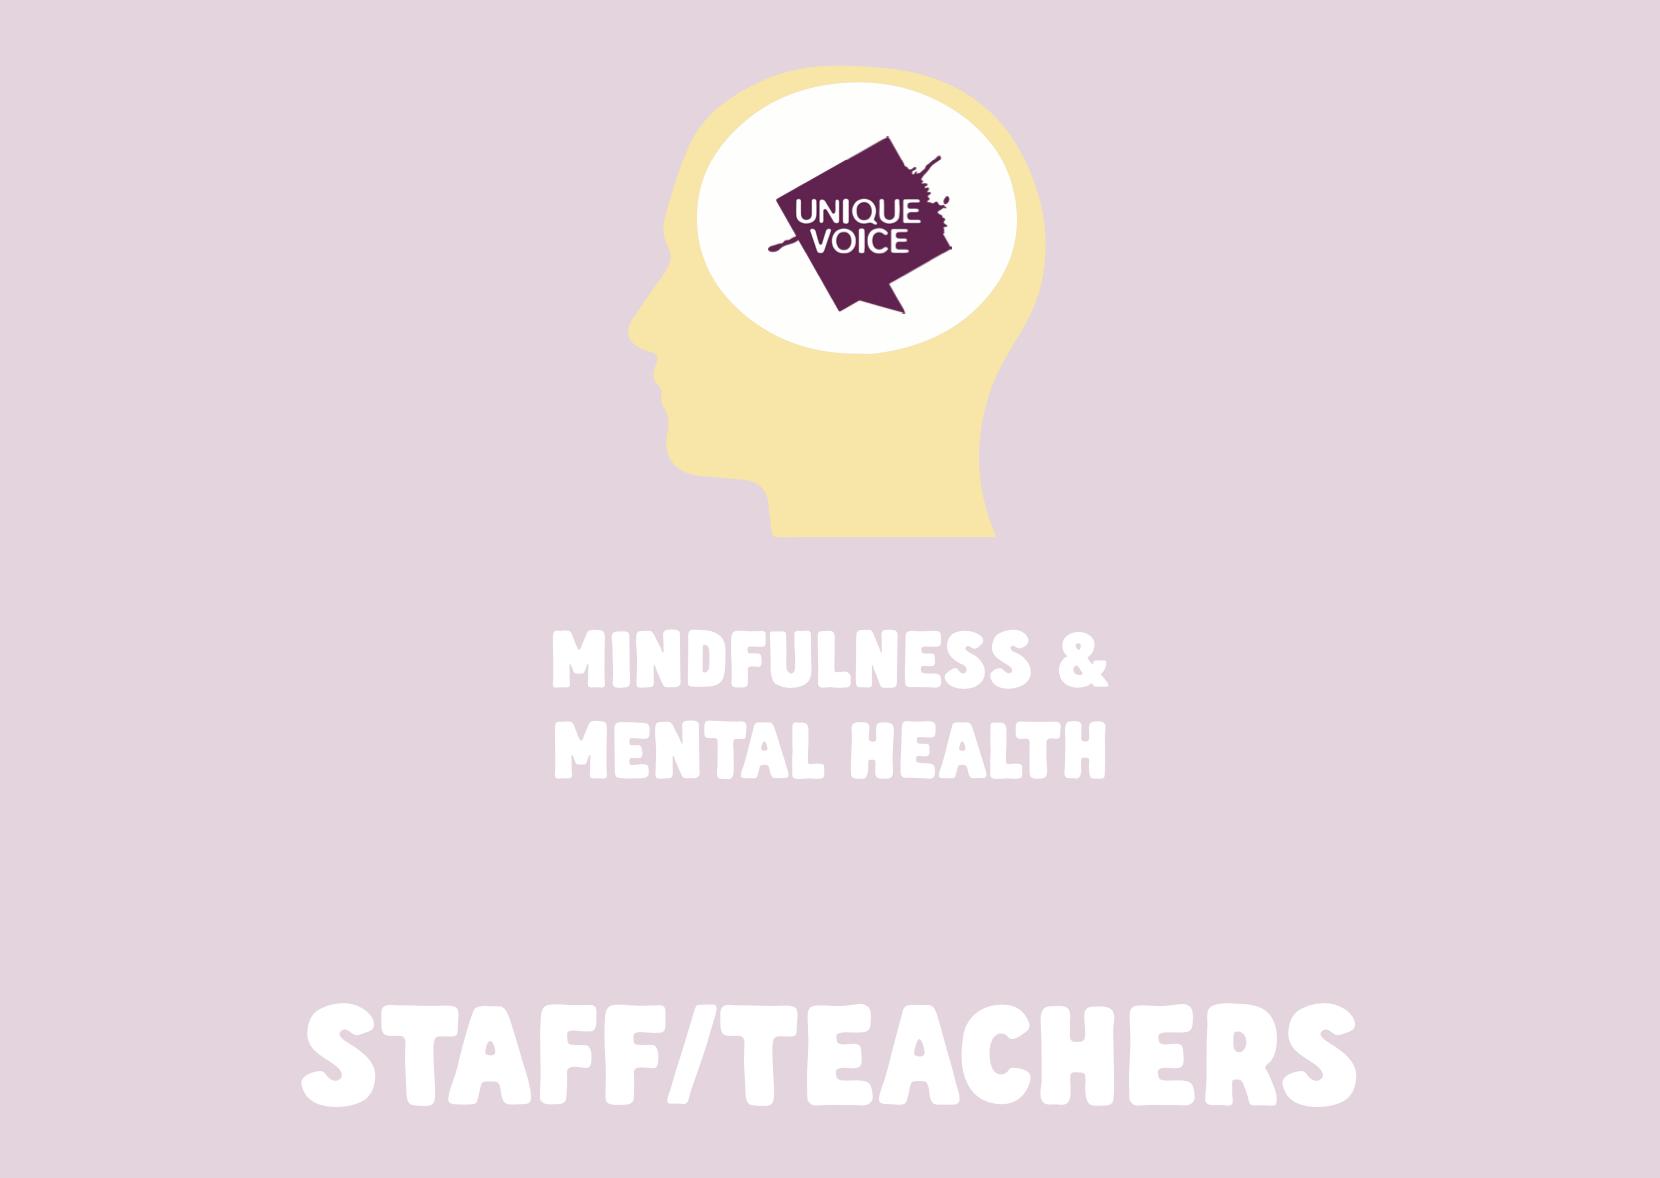 Mindfulness/Mental Health for Teachers